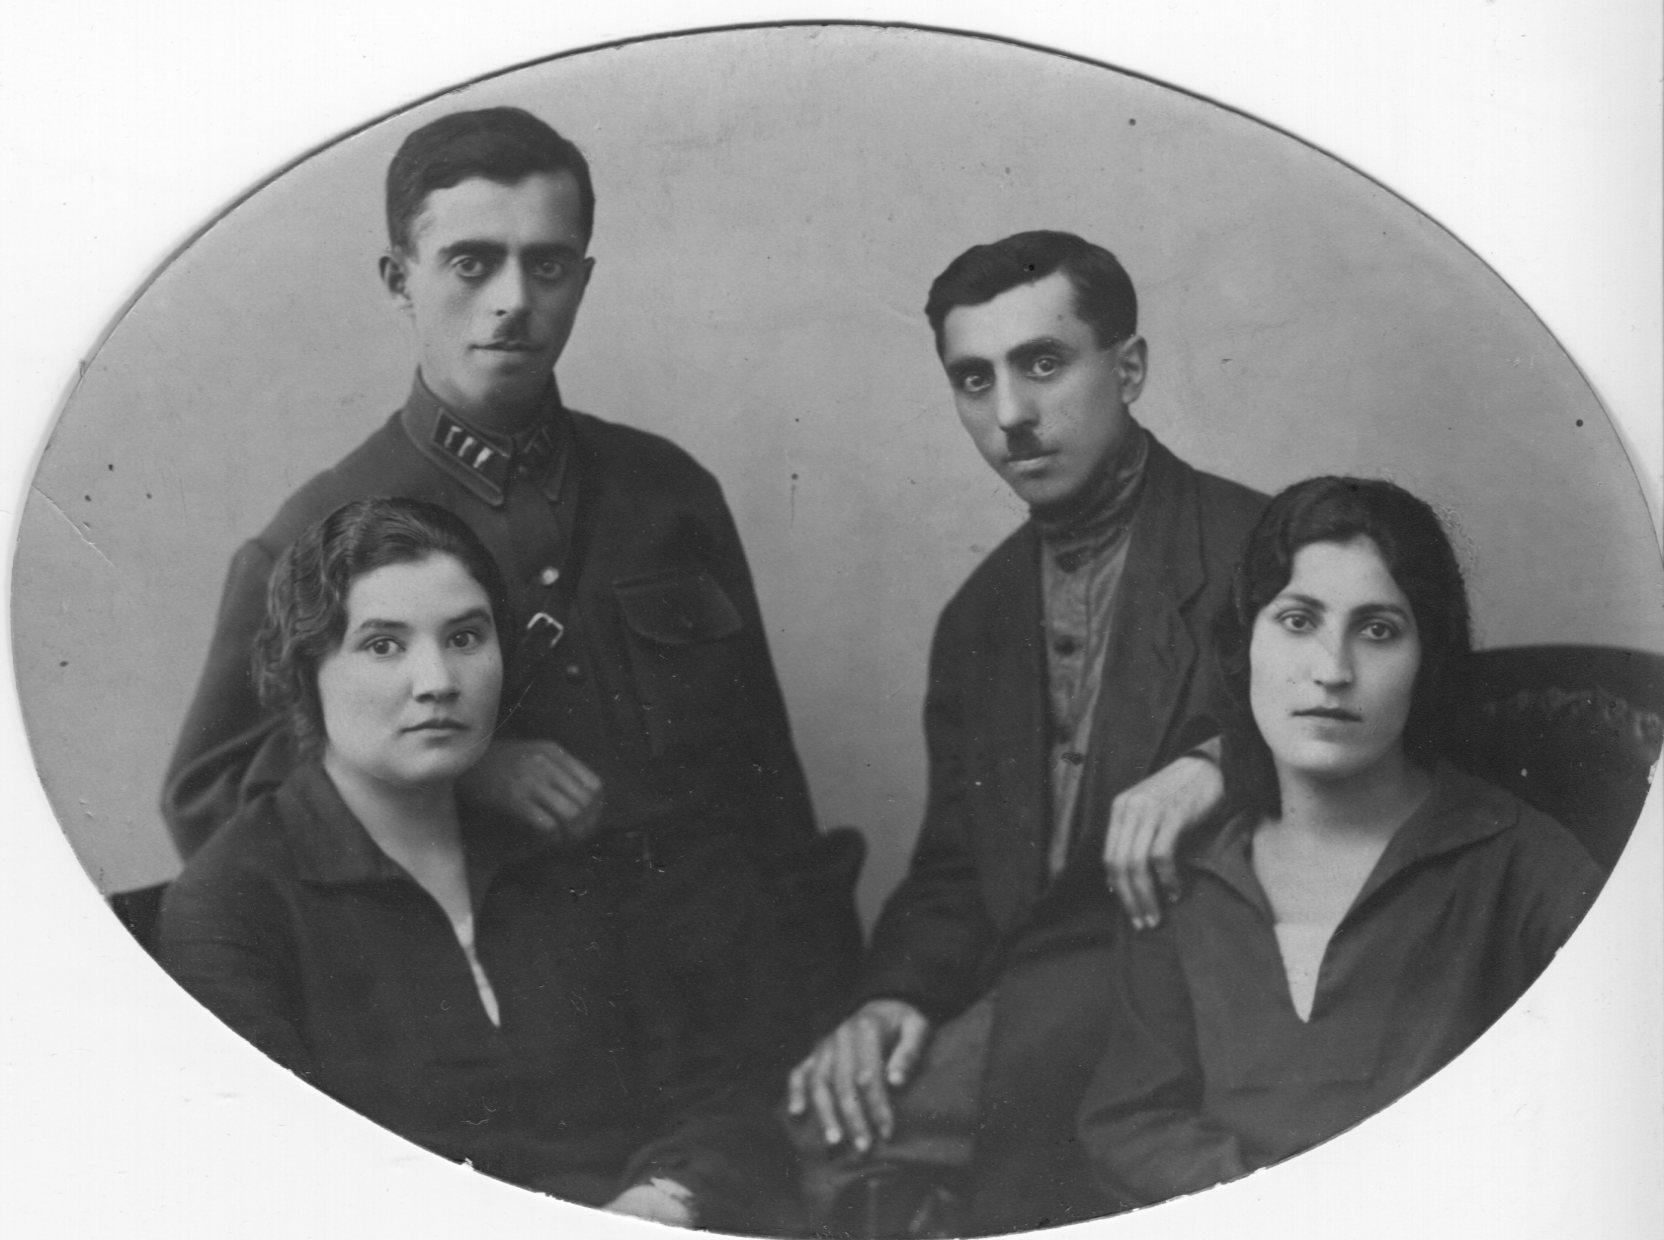 Iosif and Tereza left, Hanuk and Sonia right001